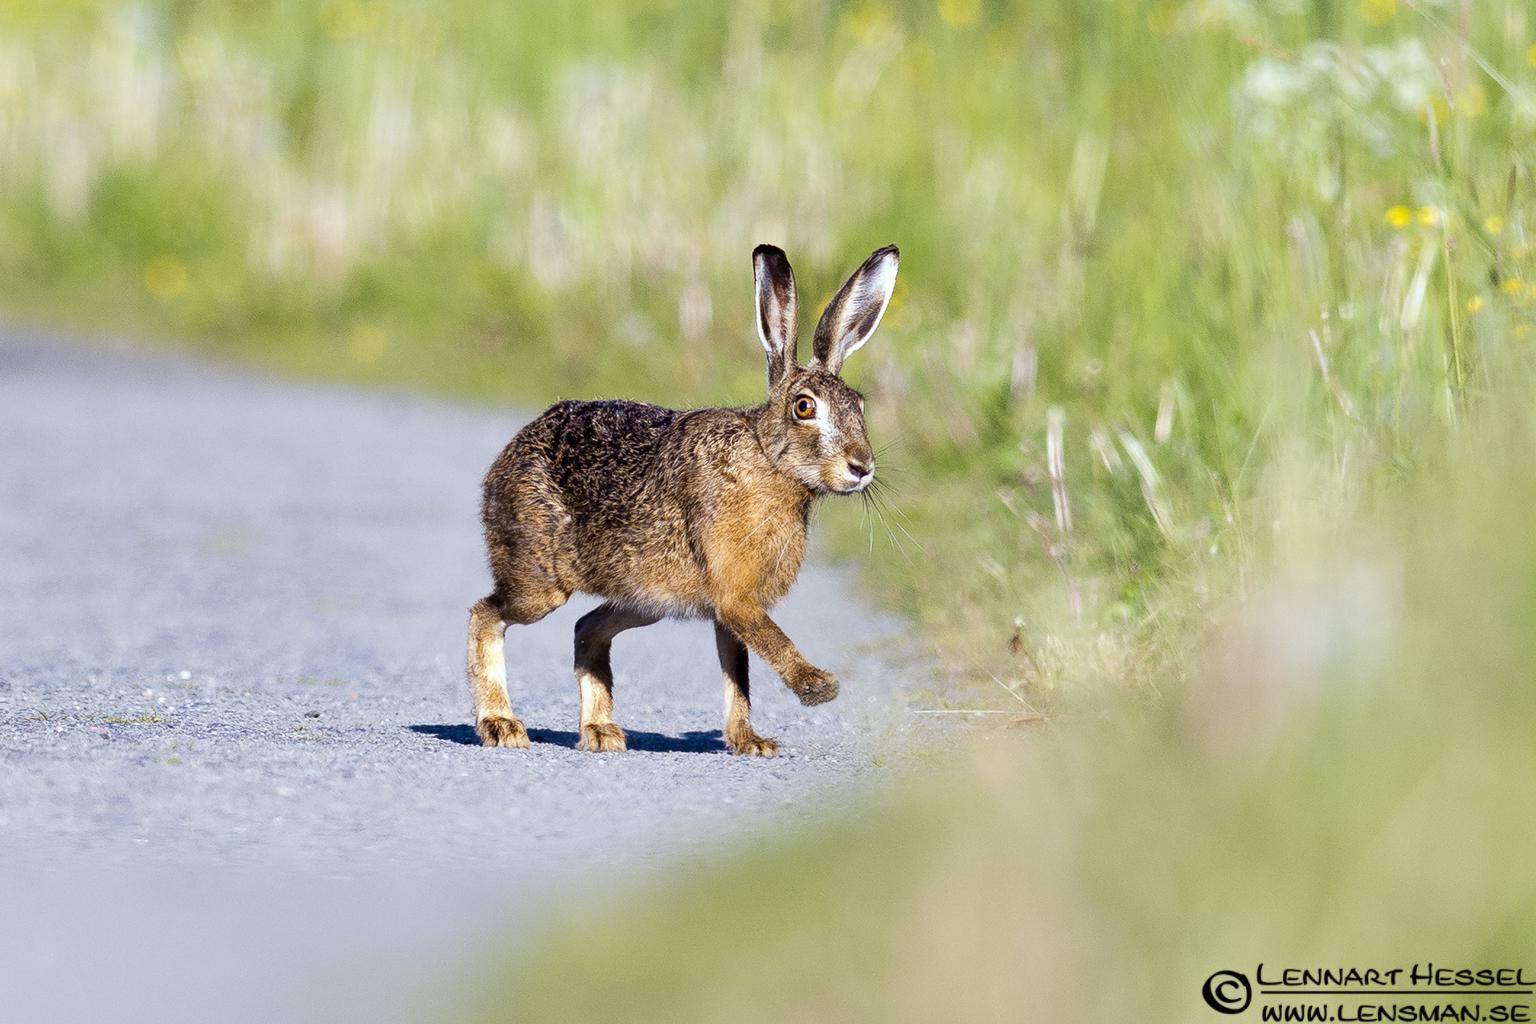 European Hare at Säveån, Gothenburg